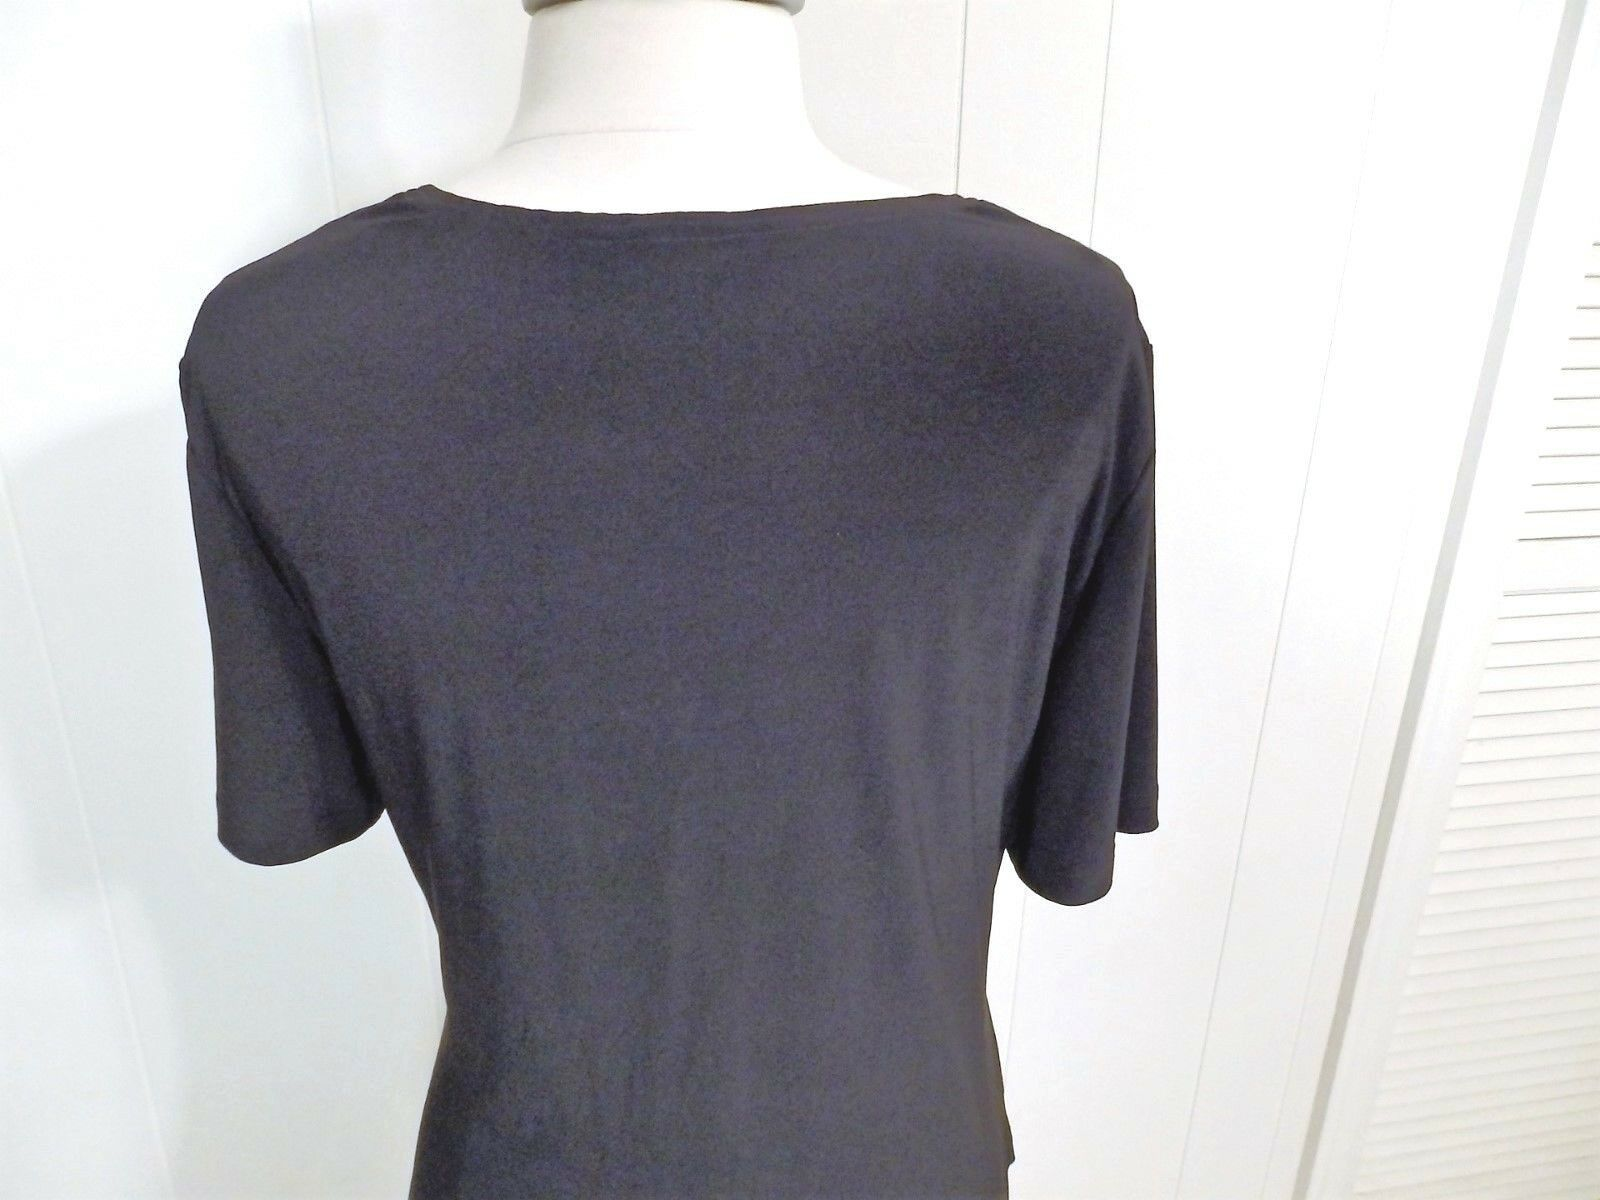 L XL 14 16 Top Blouse Shirt Pullove Women Sleev Solid Stretch Black Multi Career